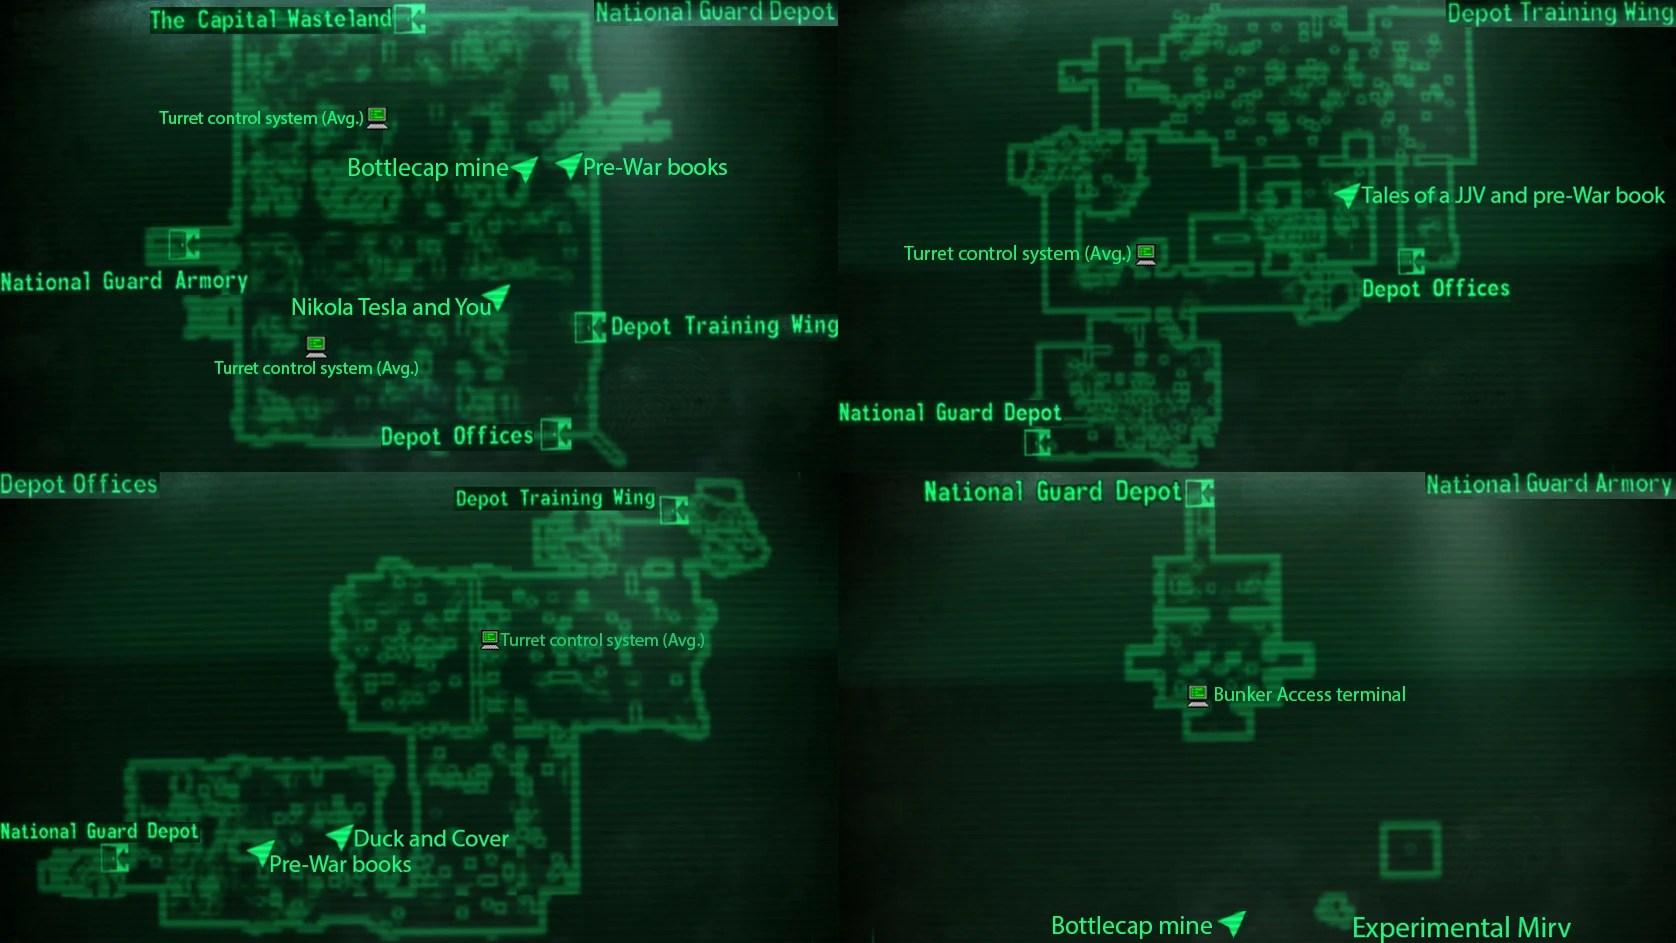 Image National Guard Depot Mapjpg Fallout Wiki FANDOM Powered By Wikia